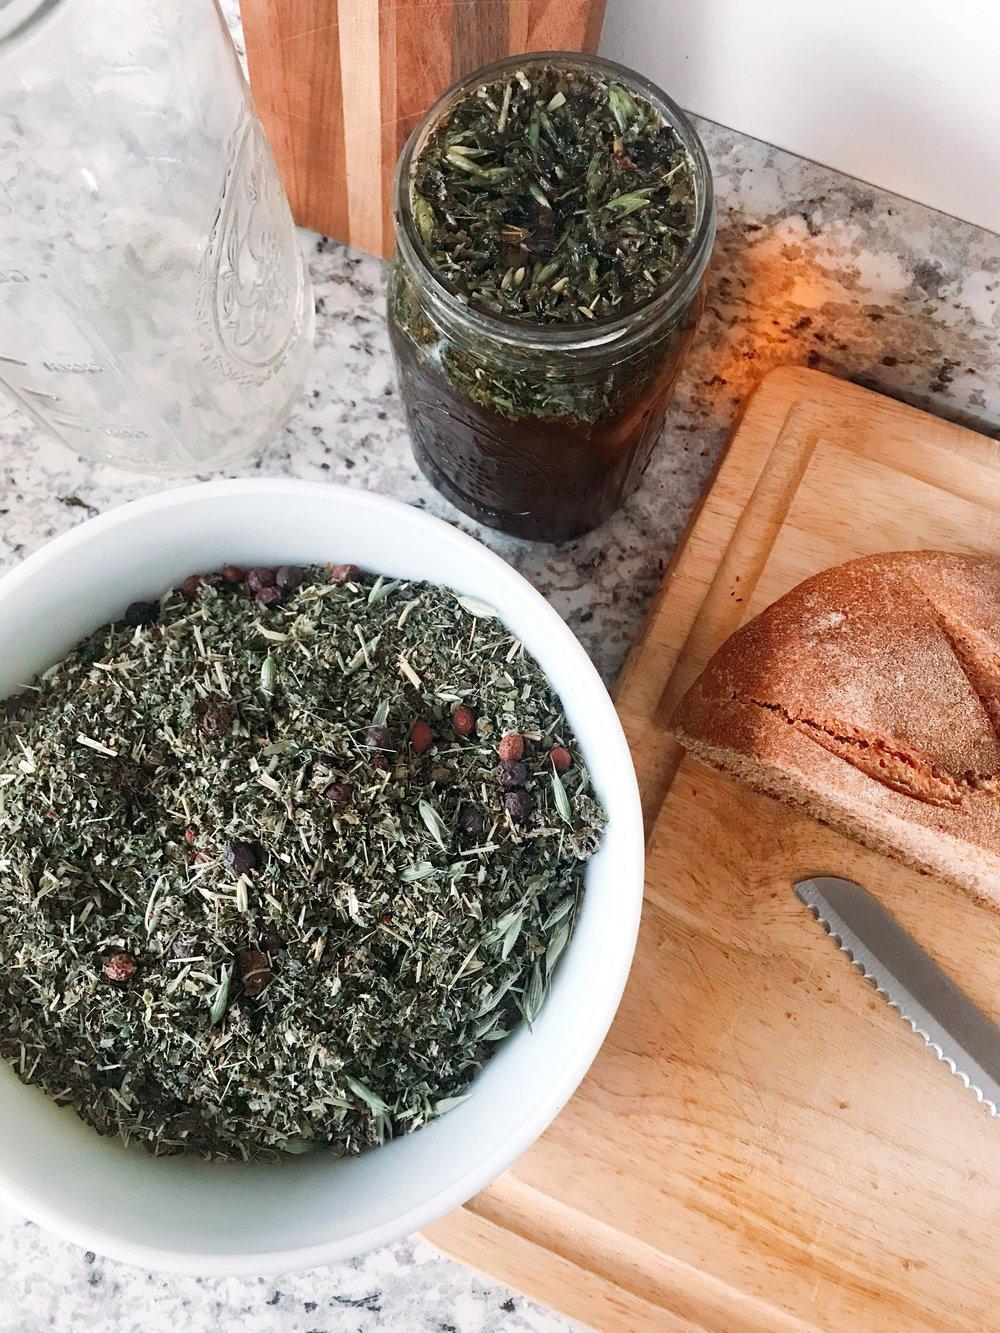 Mixing a nettle, oatstraw, raspberry leaf, rosehip, hawthorn berry, & lemon balm infusion